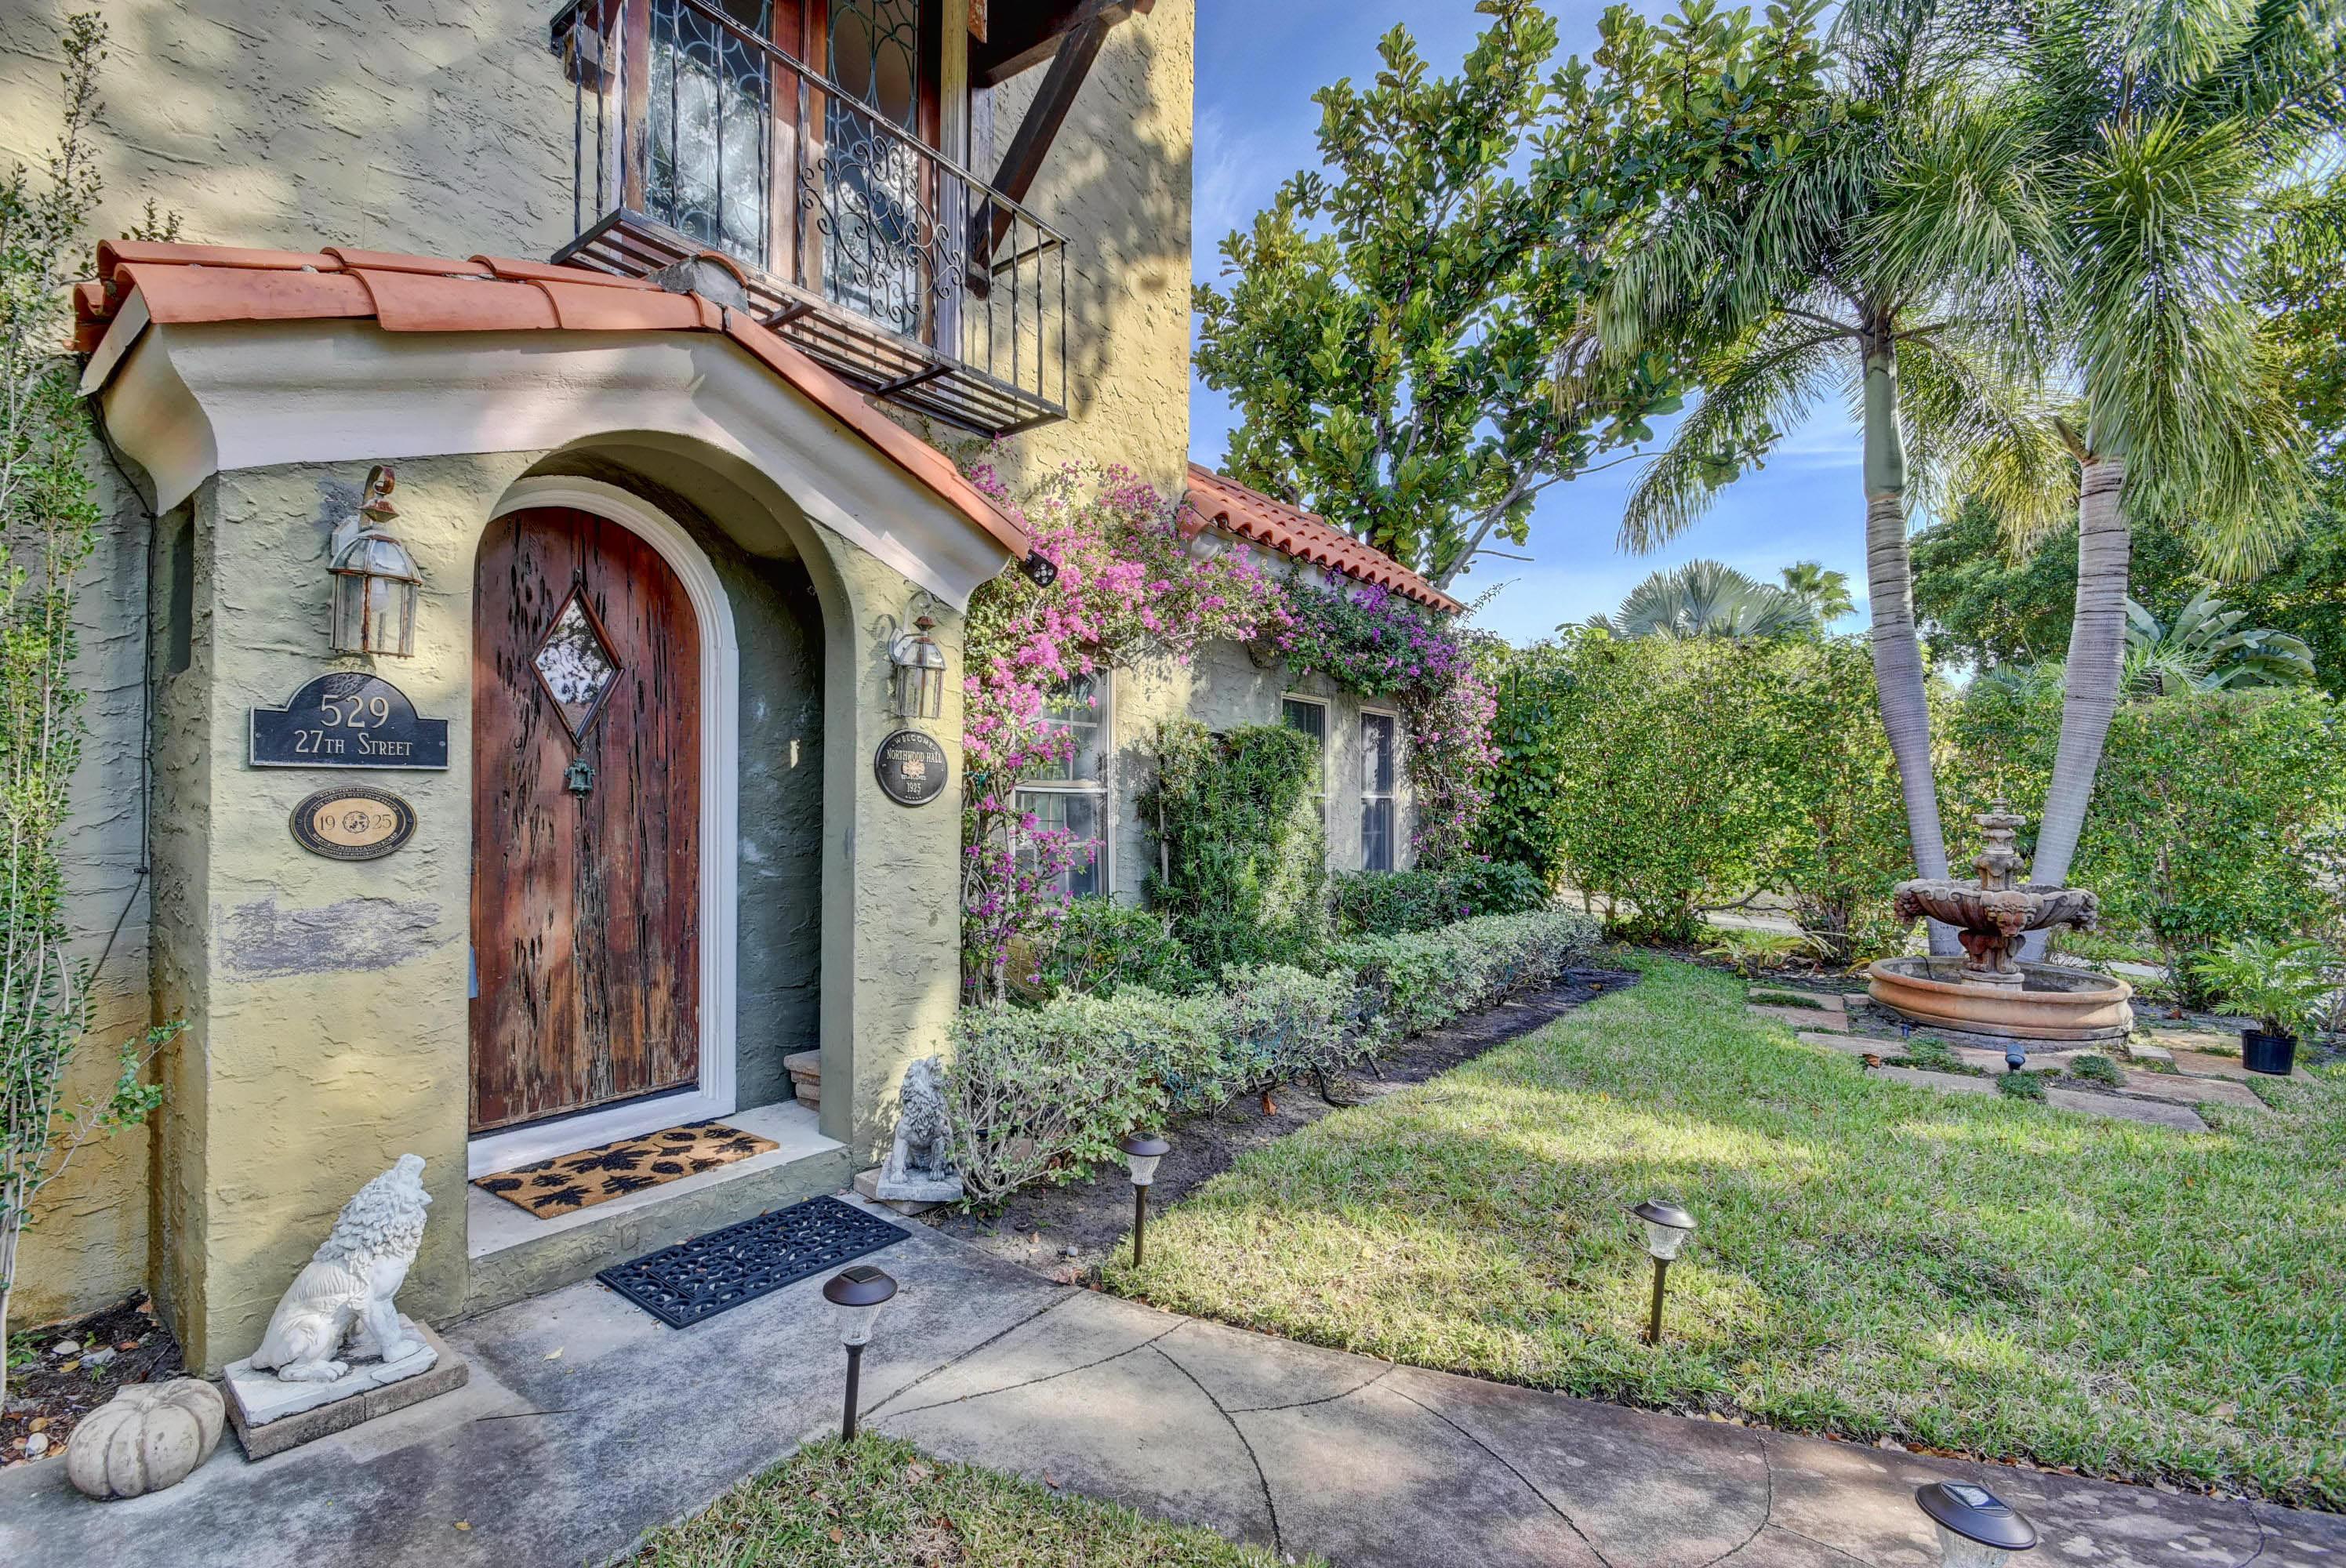 529 27th Street West Palm Beach, FL 33407